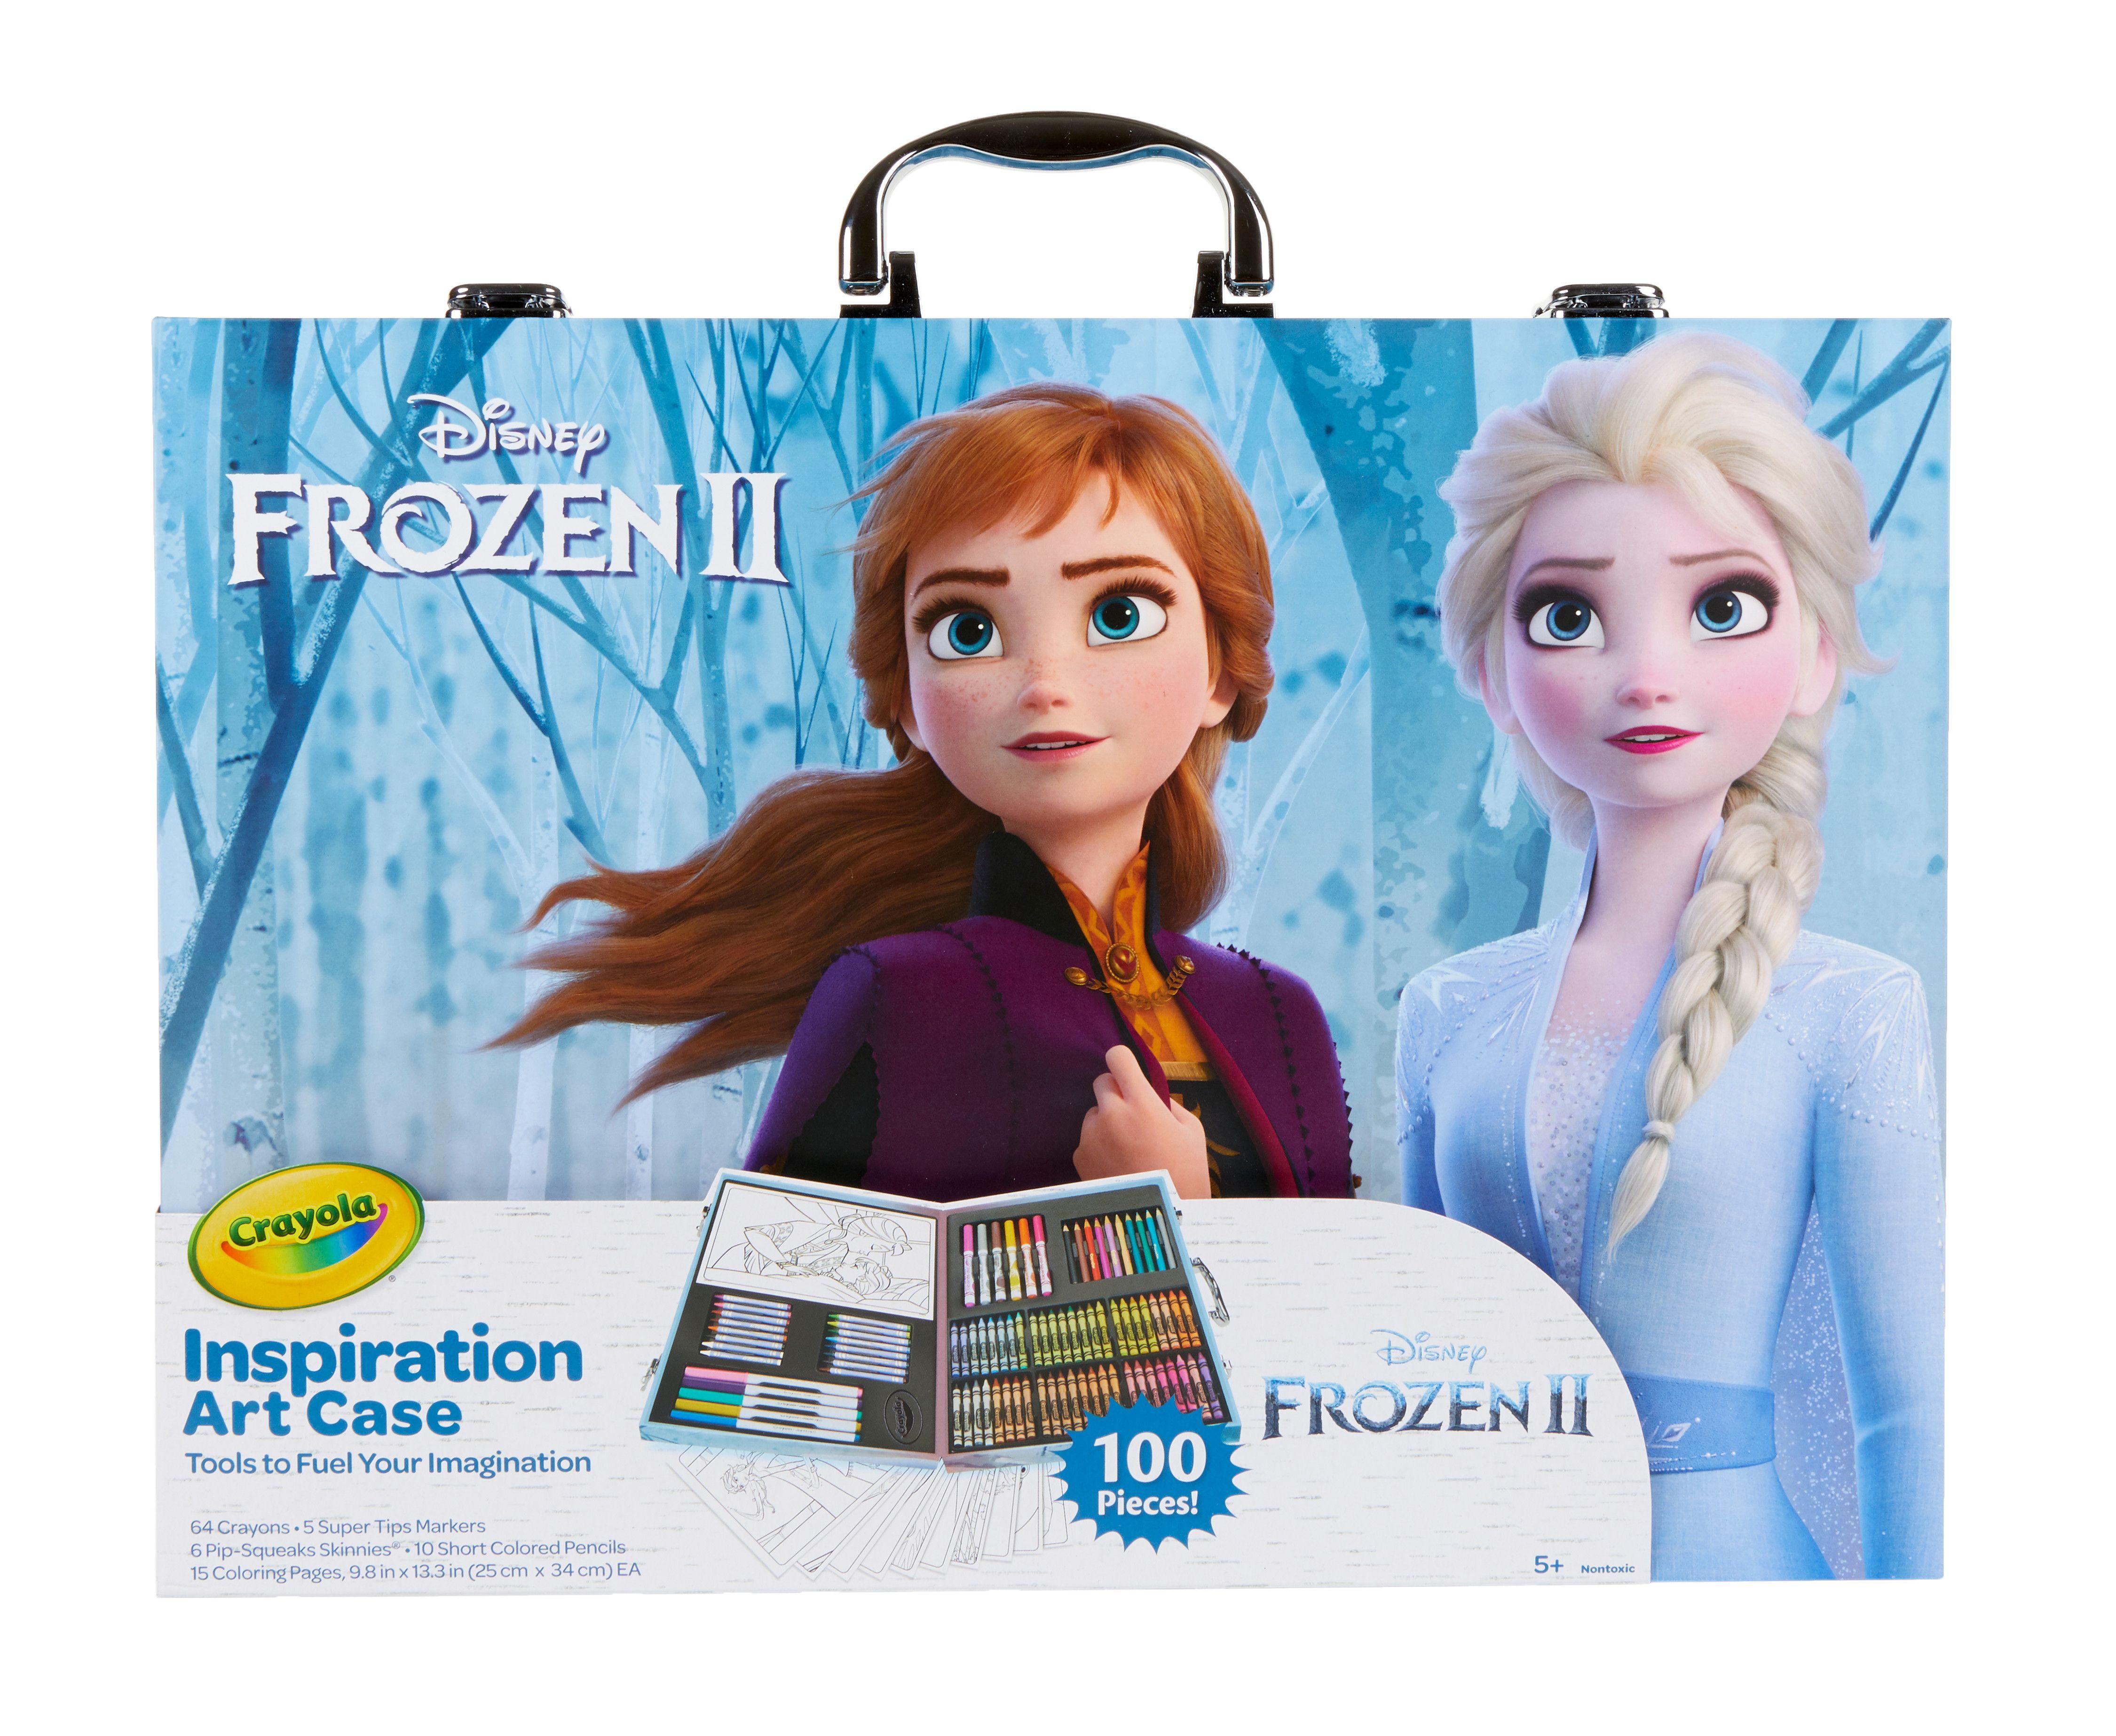 Crayola Frozen 2 Inspiration Art Case 100 Pieces Gift For Children Ages 3 Walmart Com Art Case Art Inspiration Frozen Art